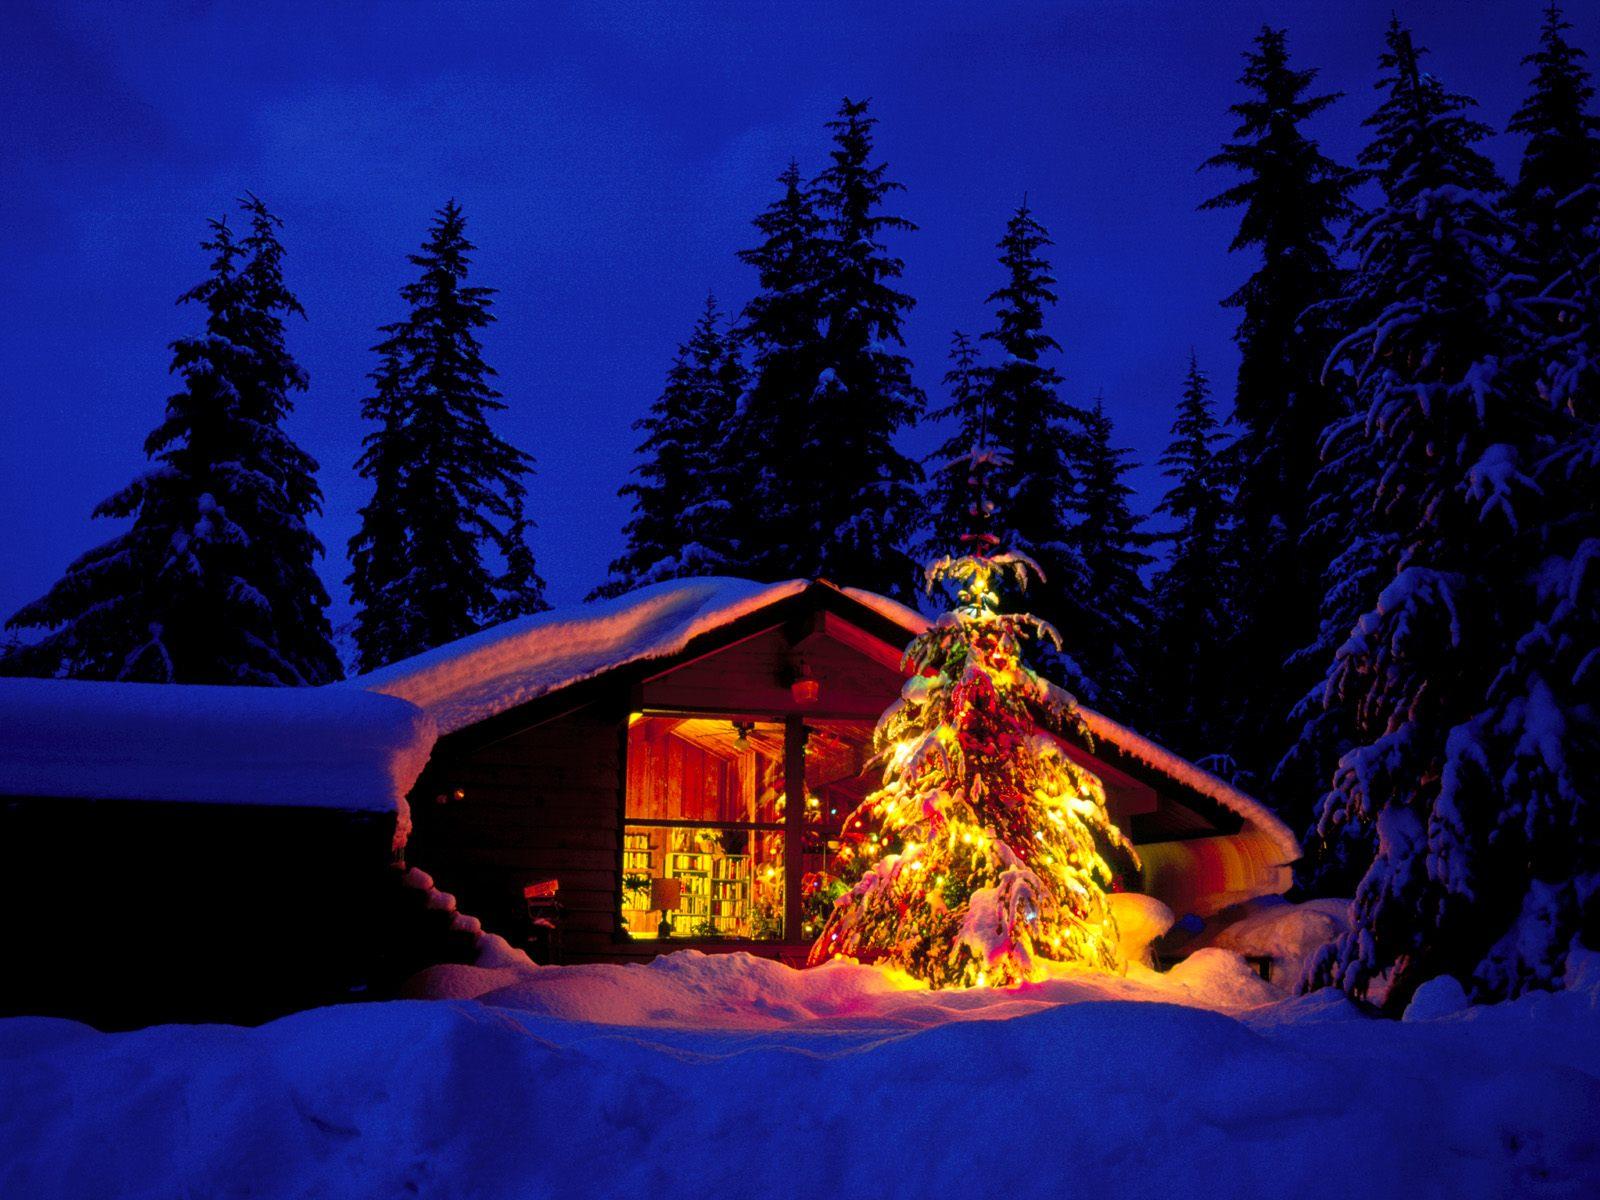 Cozy-Christmas-wallpaper-wp3804130